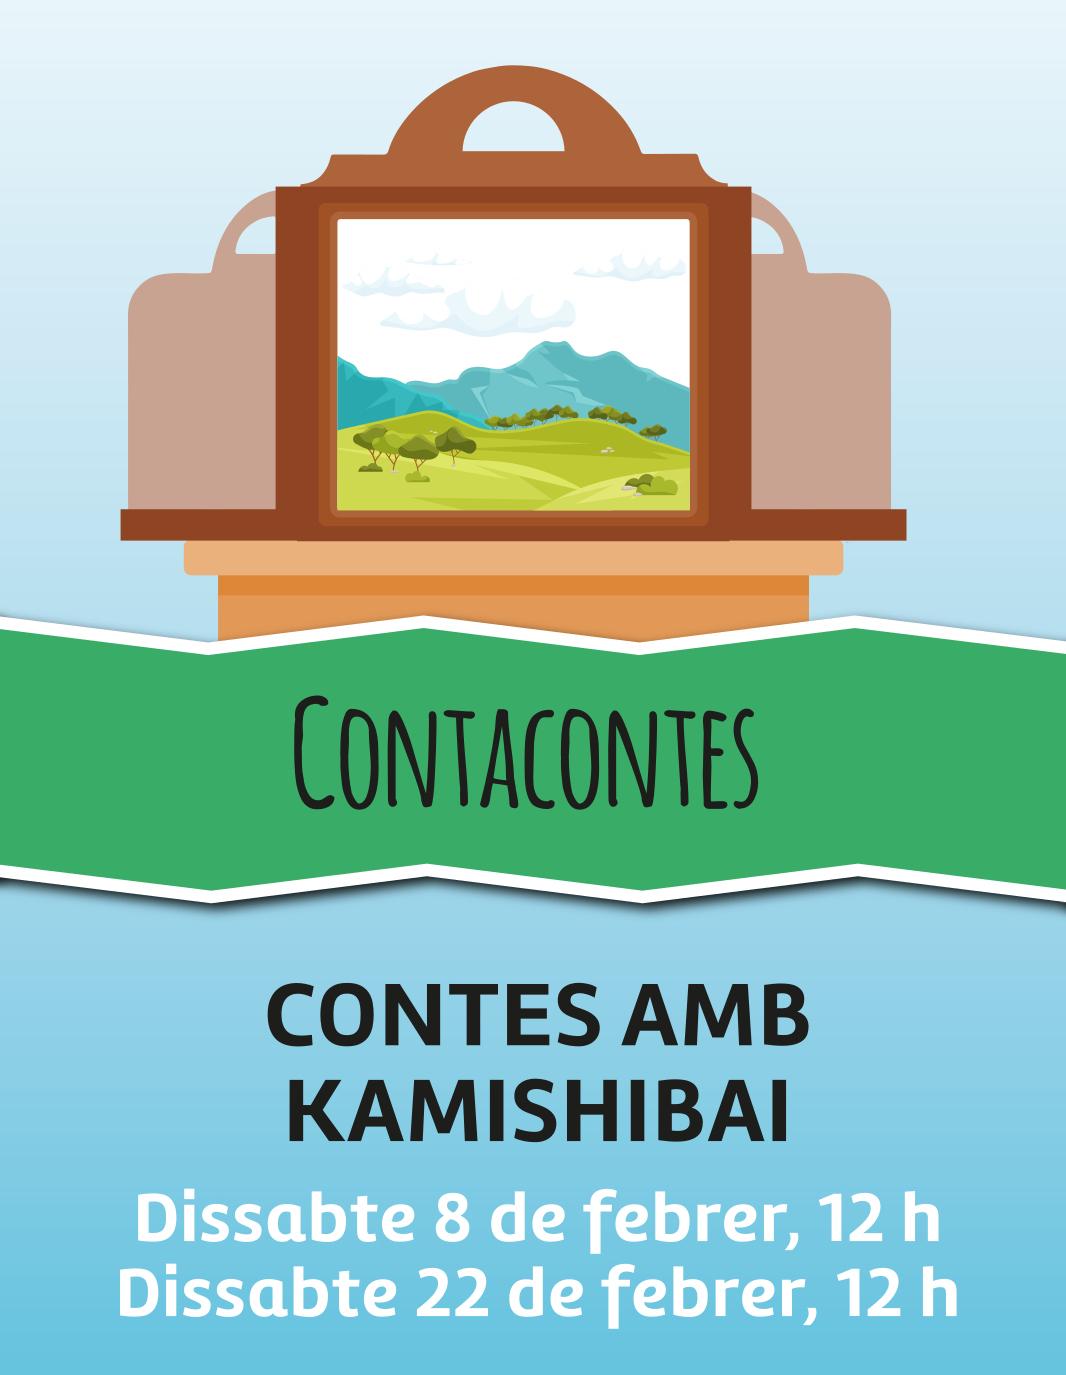 CONTES AMB KAMISHIBAI